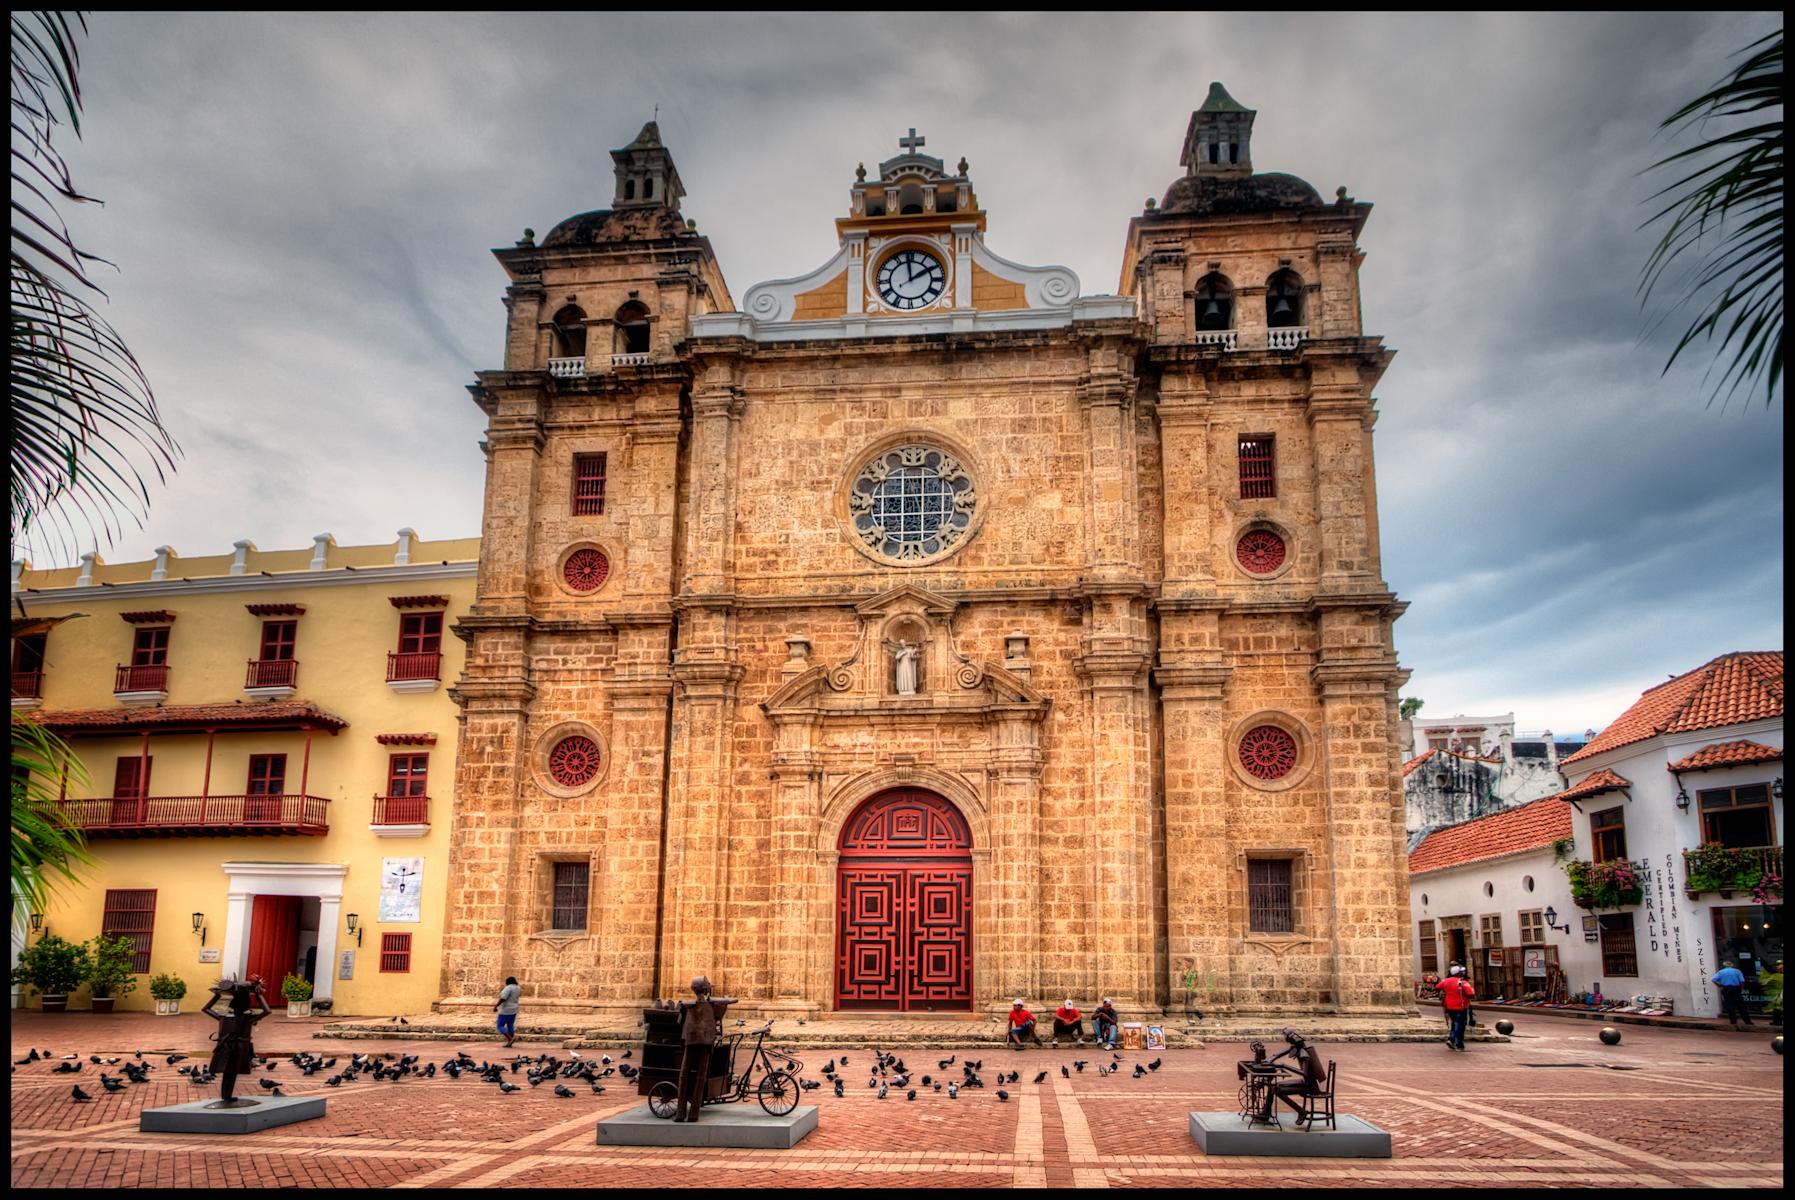 Cartagena Walled City Hotels